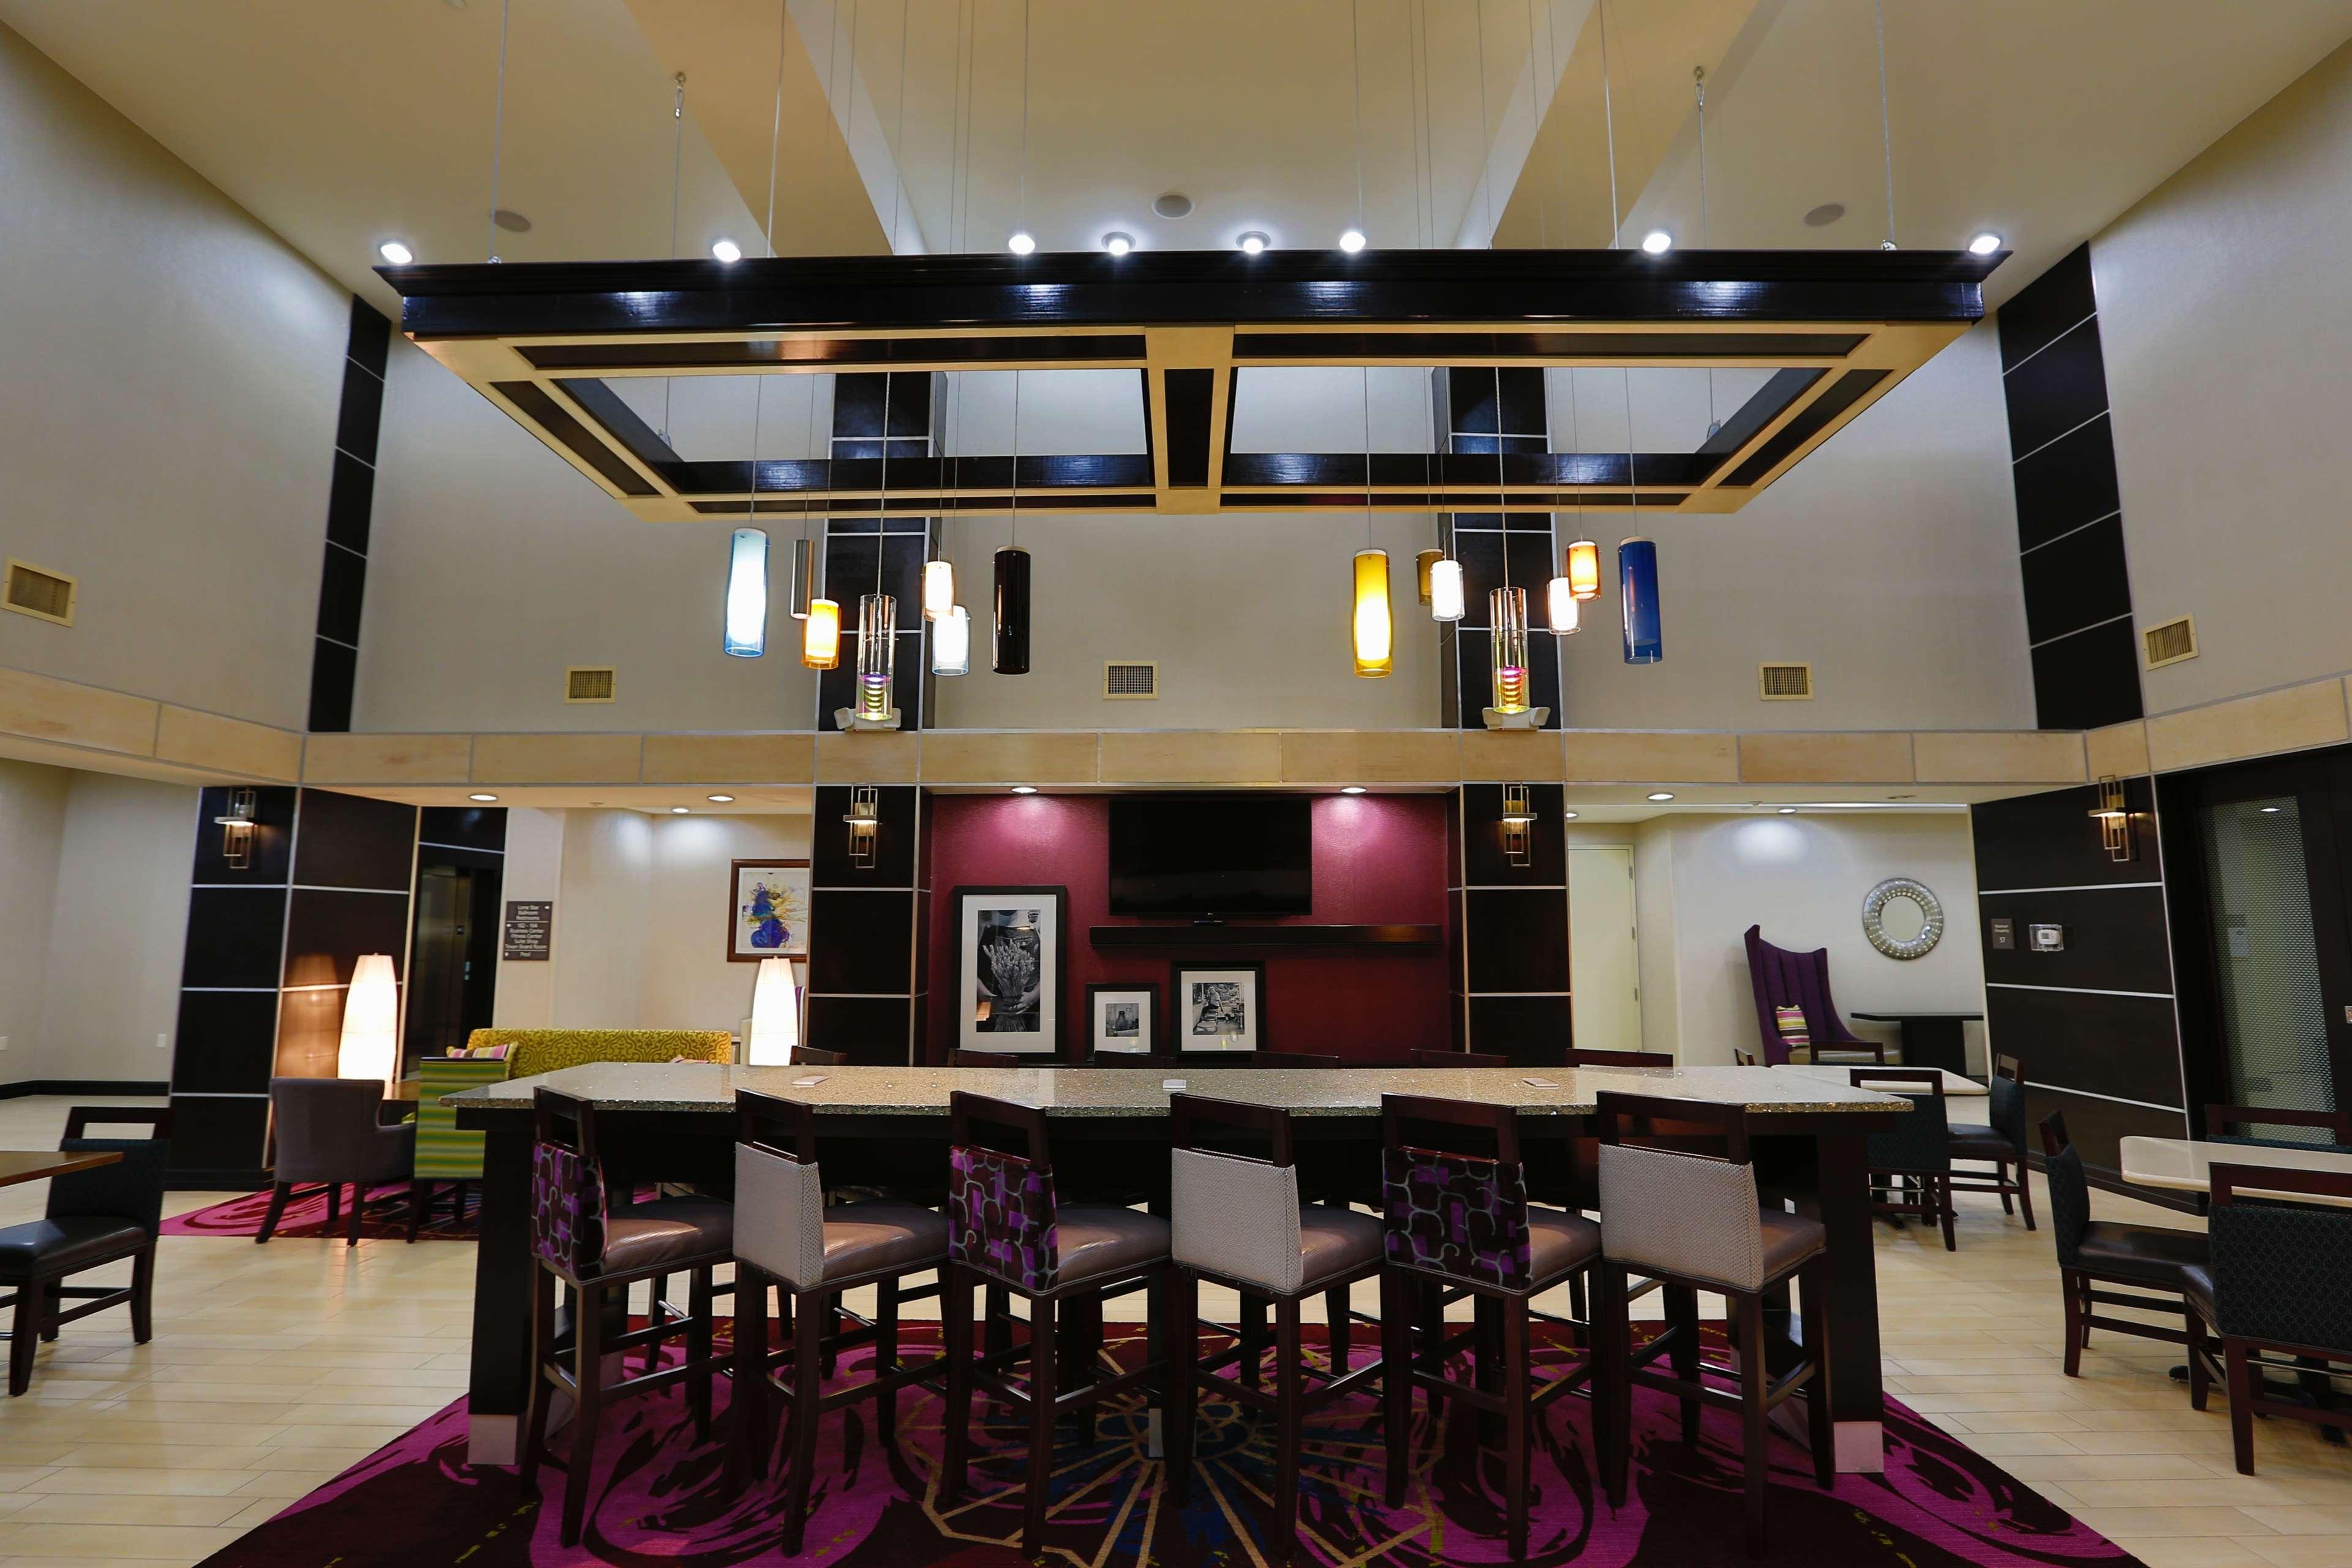 Hampton Inn & Suites Missouri City, TX image 10